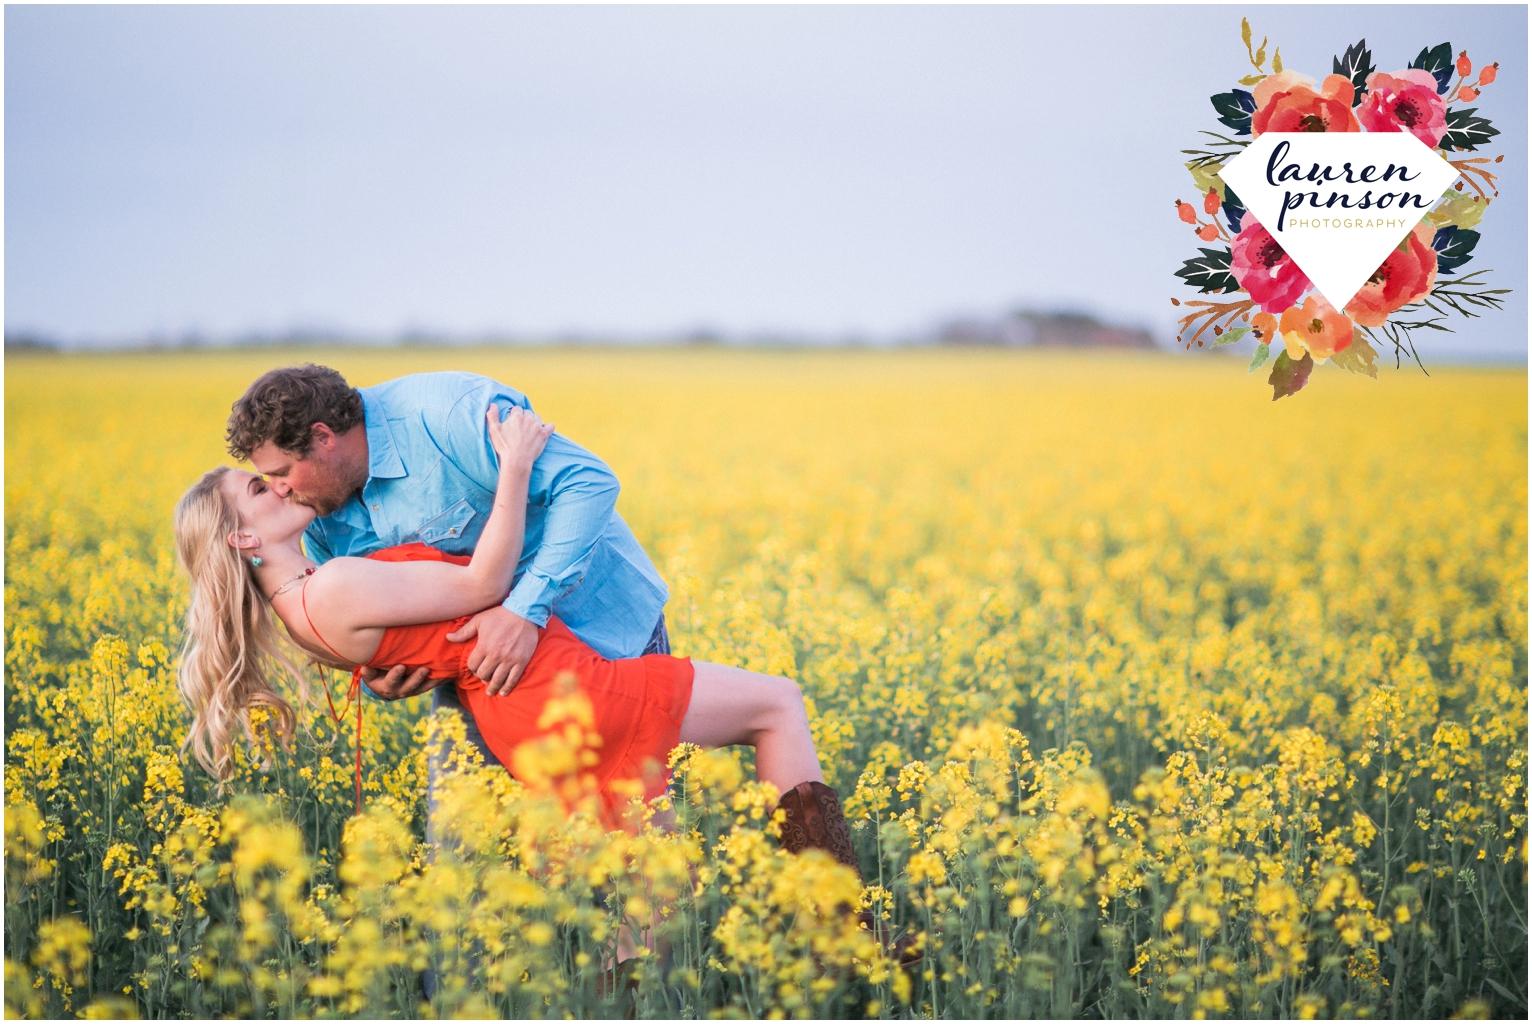 wichita-falls-wedding-photographer-engagement-session-texas-photography-oklahoma-engagement-wedding-photography_0630.jpg